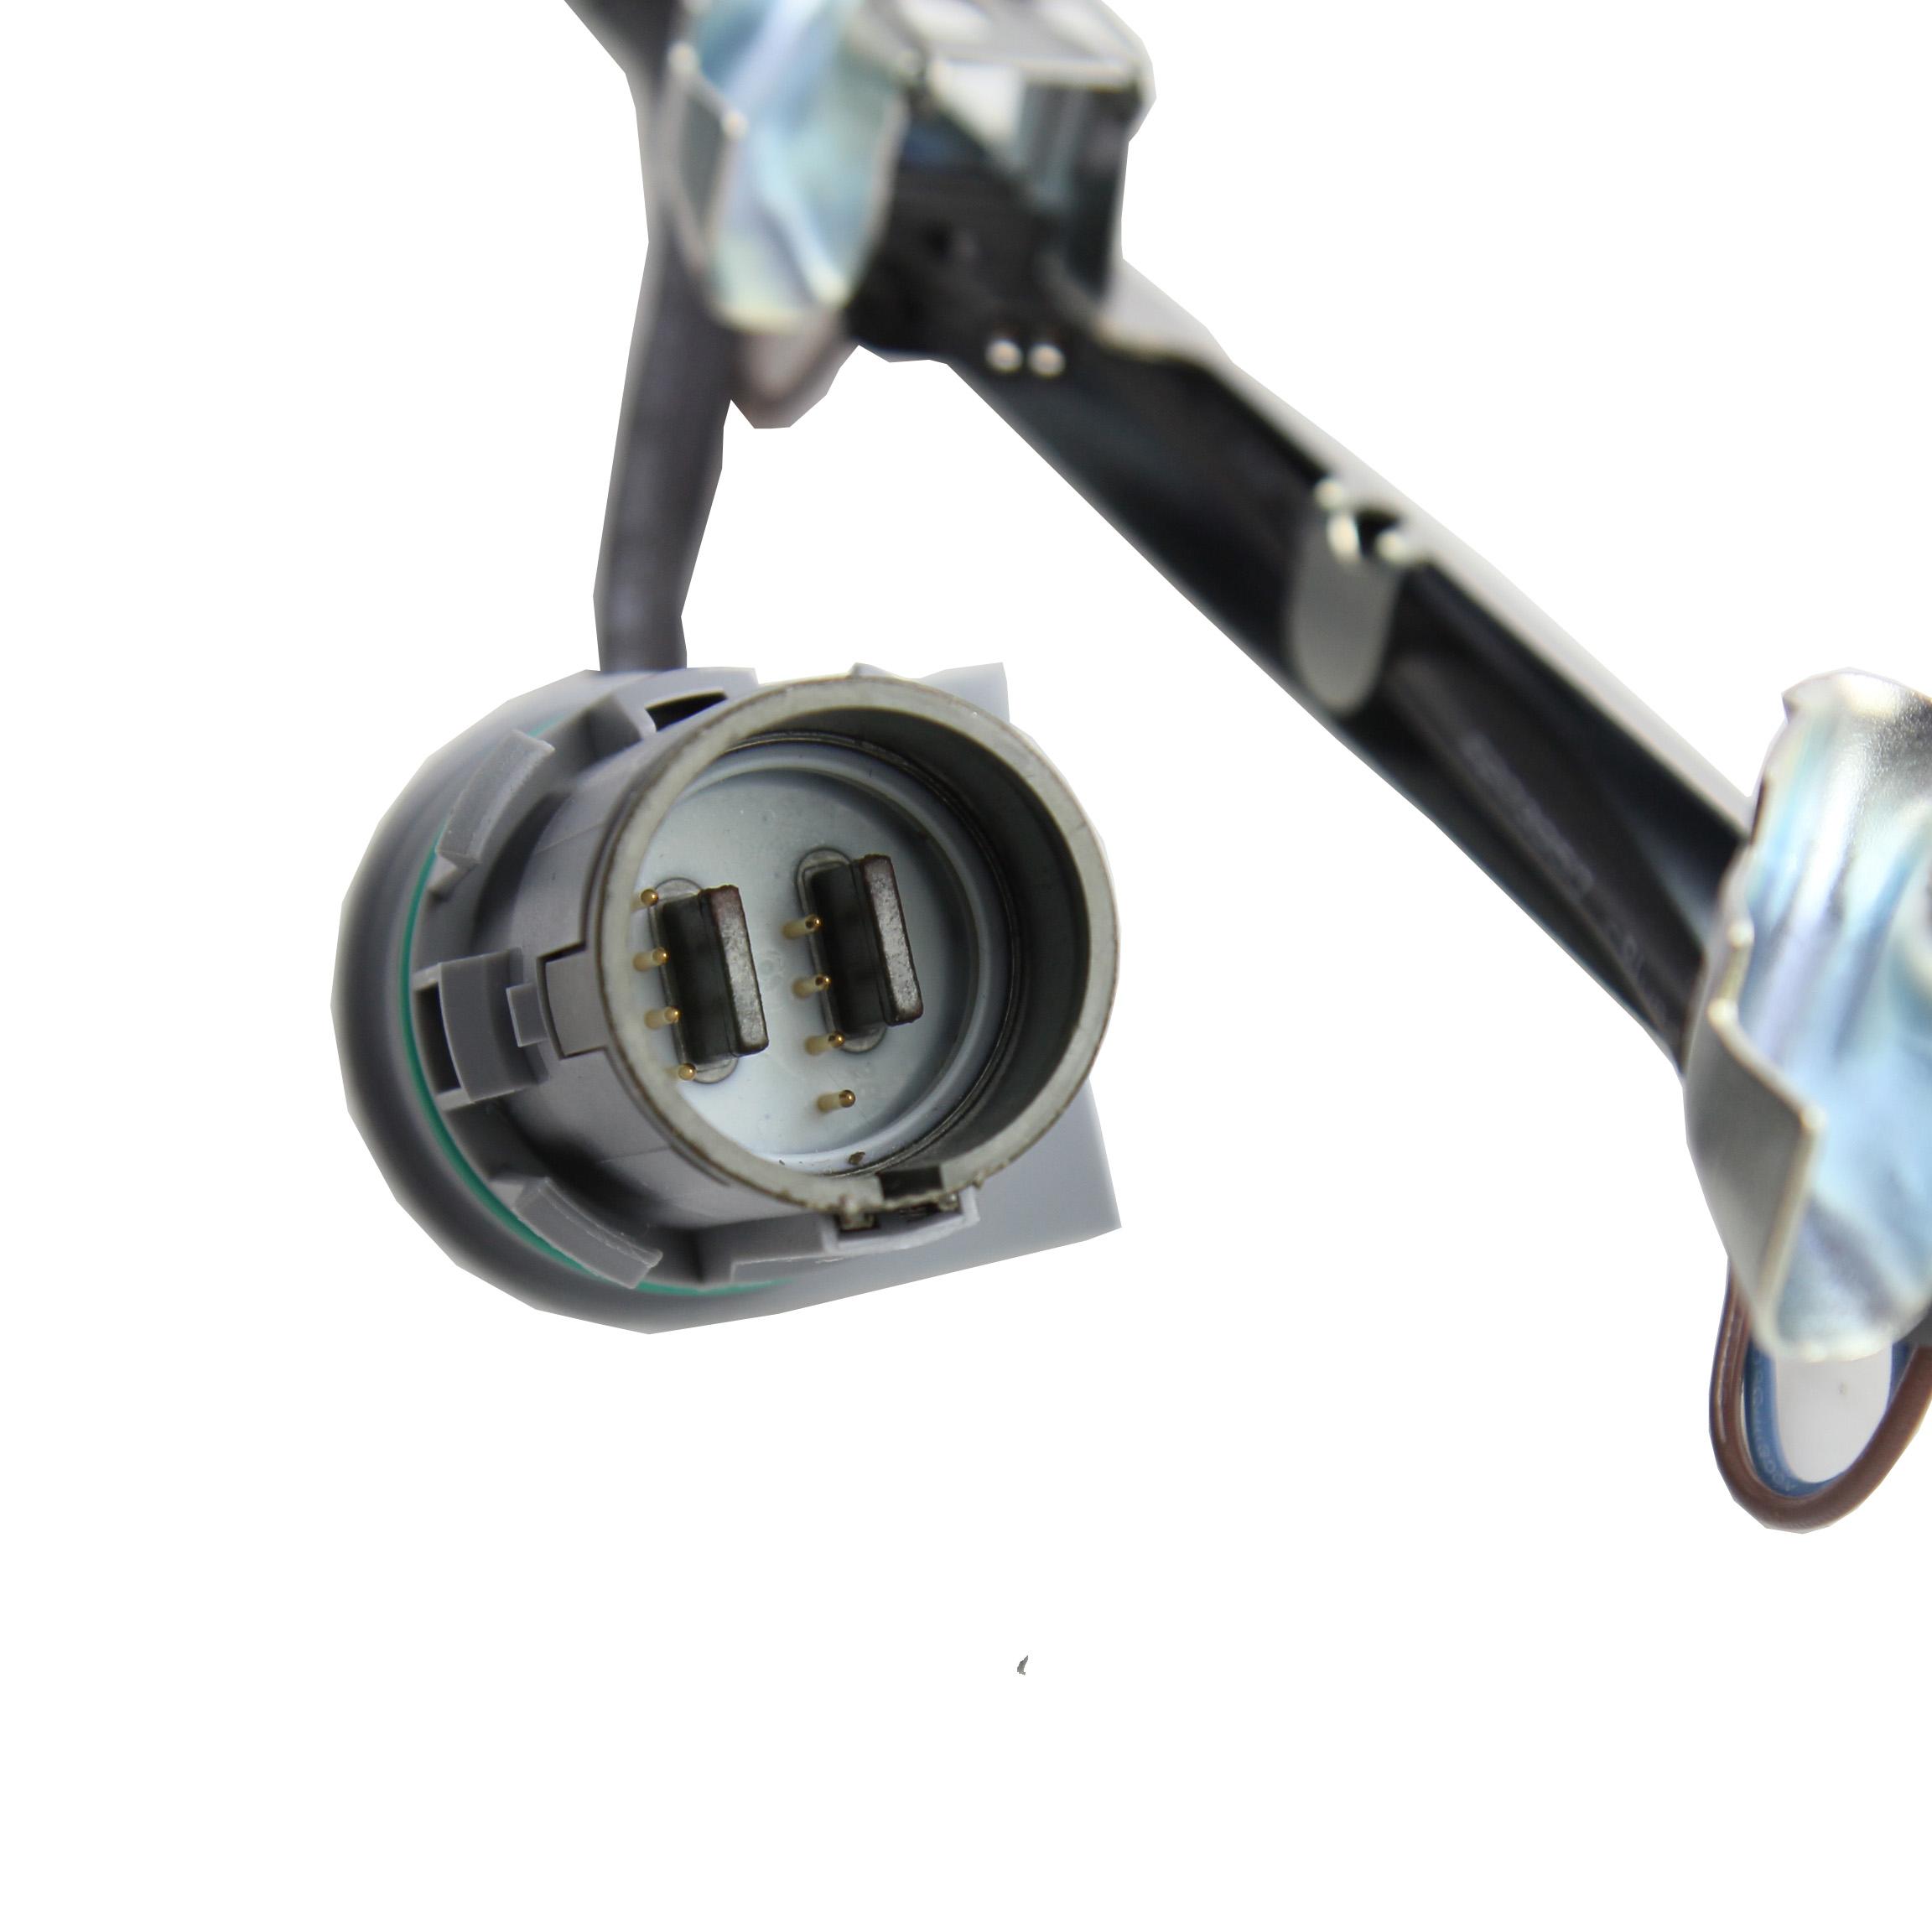 Details about New Injector Harness For Navistar International DT466 DT530  DT466E 1889905C92